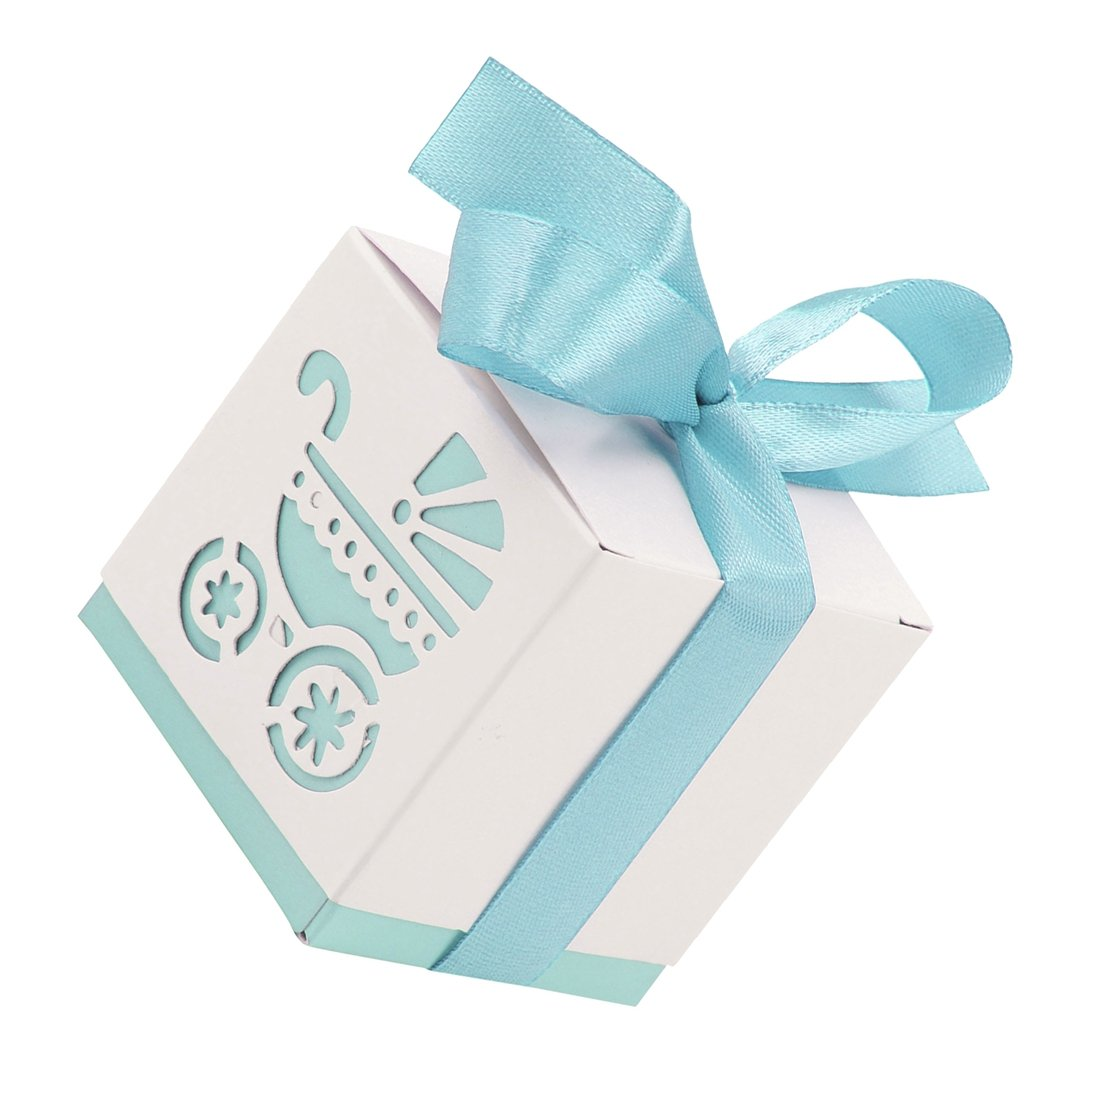 Amazon.com: Yalulu 50Pcs Carriage Pattern Candy Boxes Gift Bags Baby ...